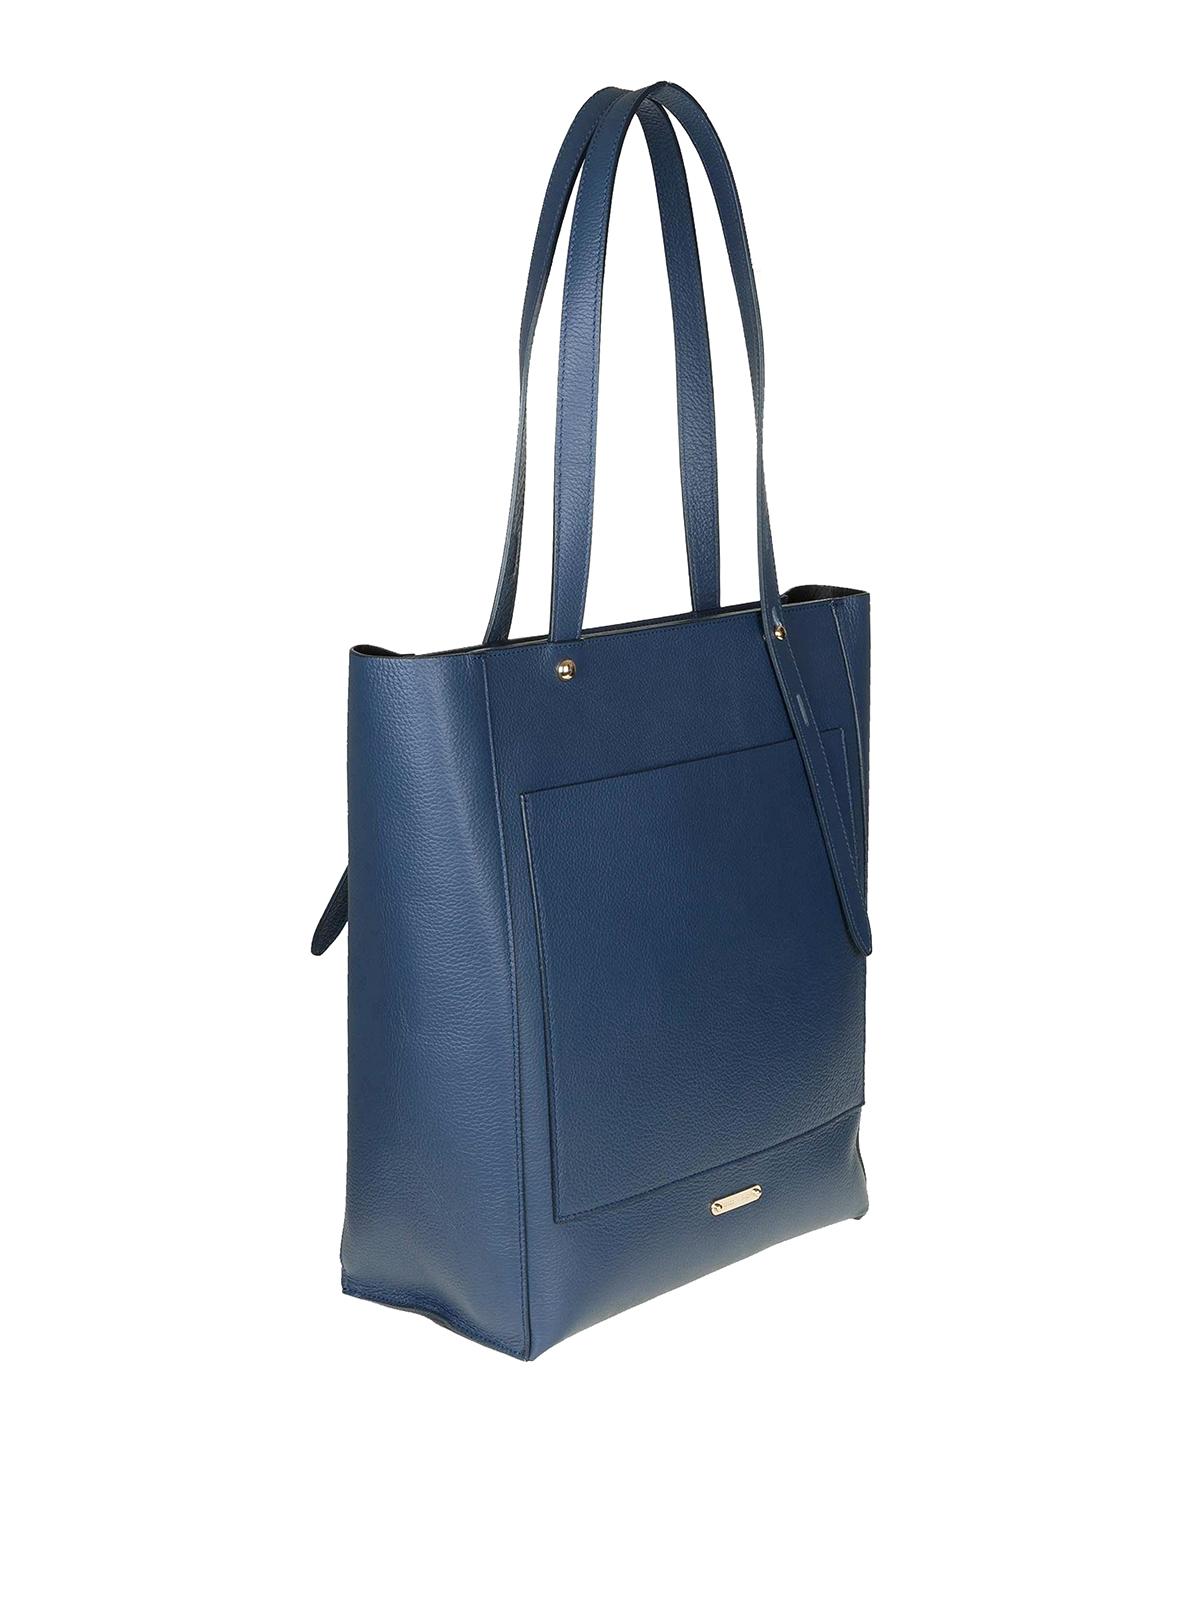 85fa2bb8c6f06 Rebecca Minkoff - Shopper - Blau - Handtaschen - HH18ISTT34 403